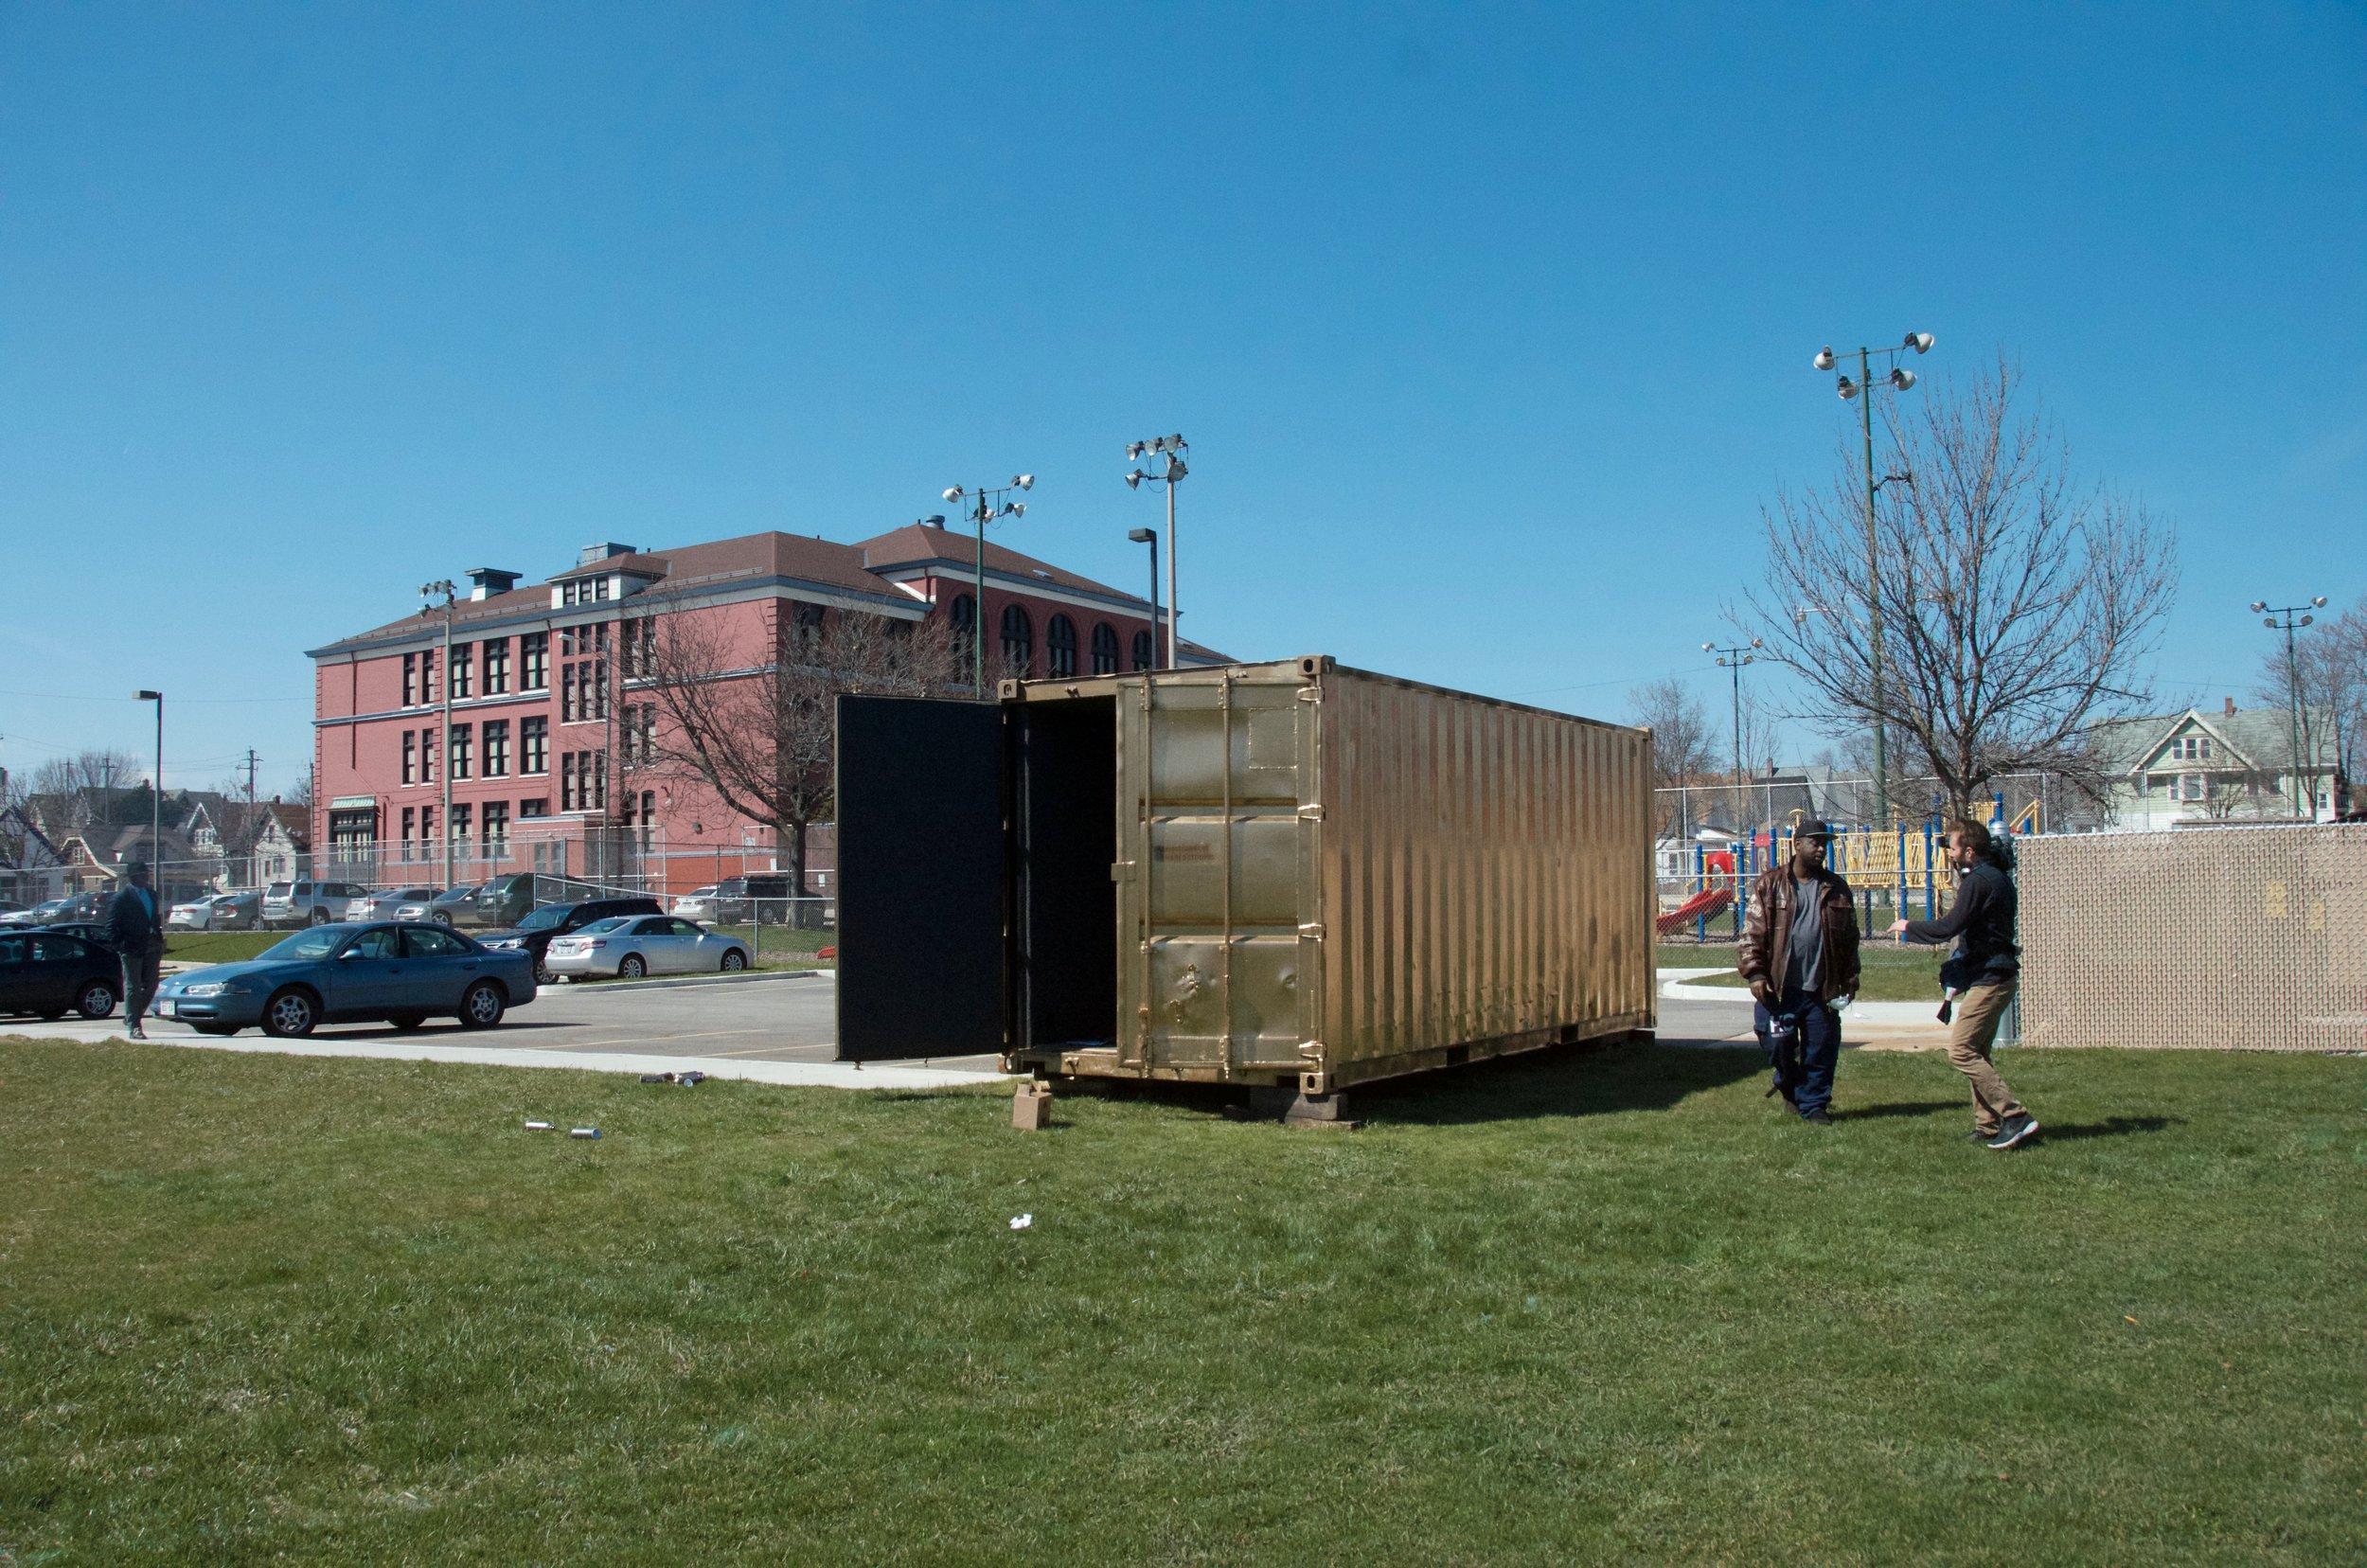 Portal in Moody Park, Milwaukee in April 2016_Credit_ Amar C. Bakshi and Shared_Studios.jpg